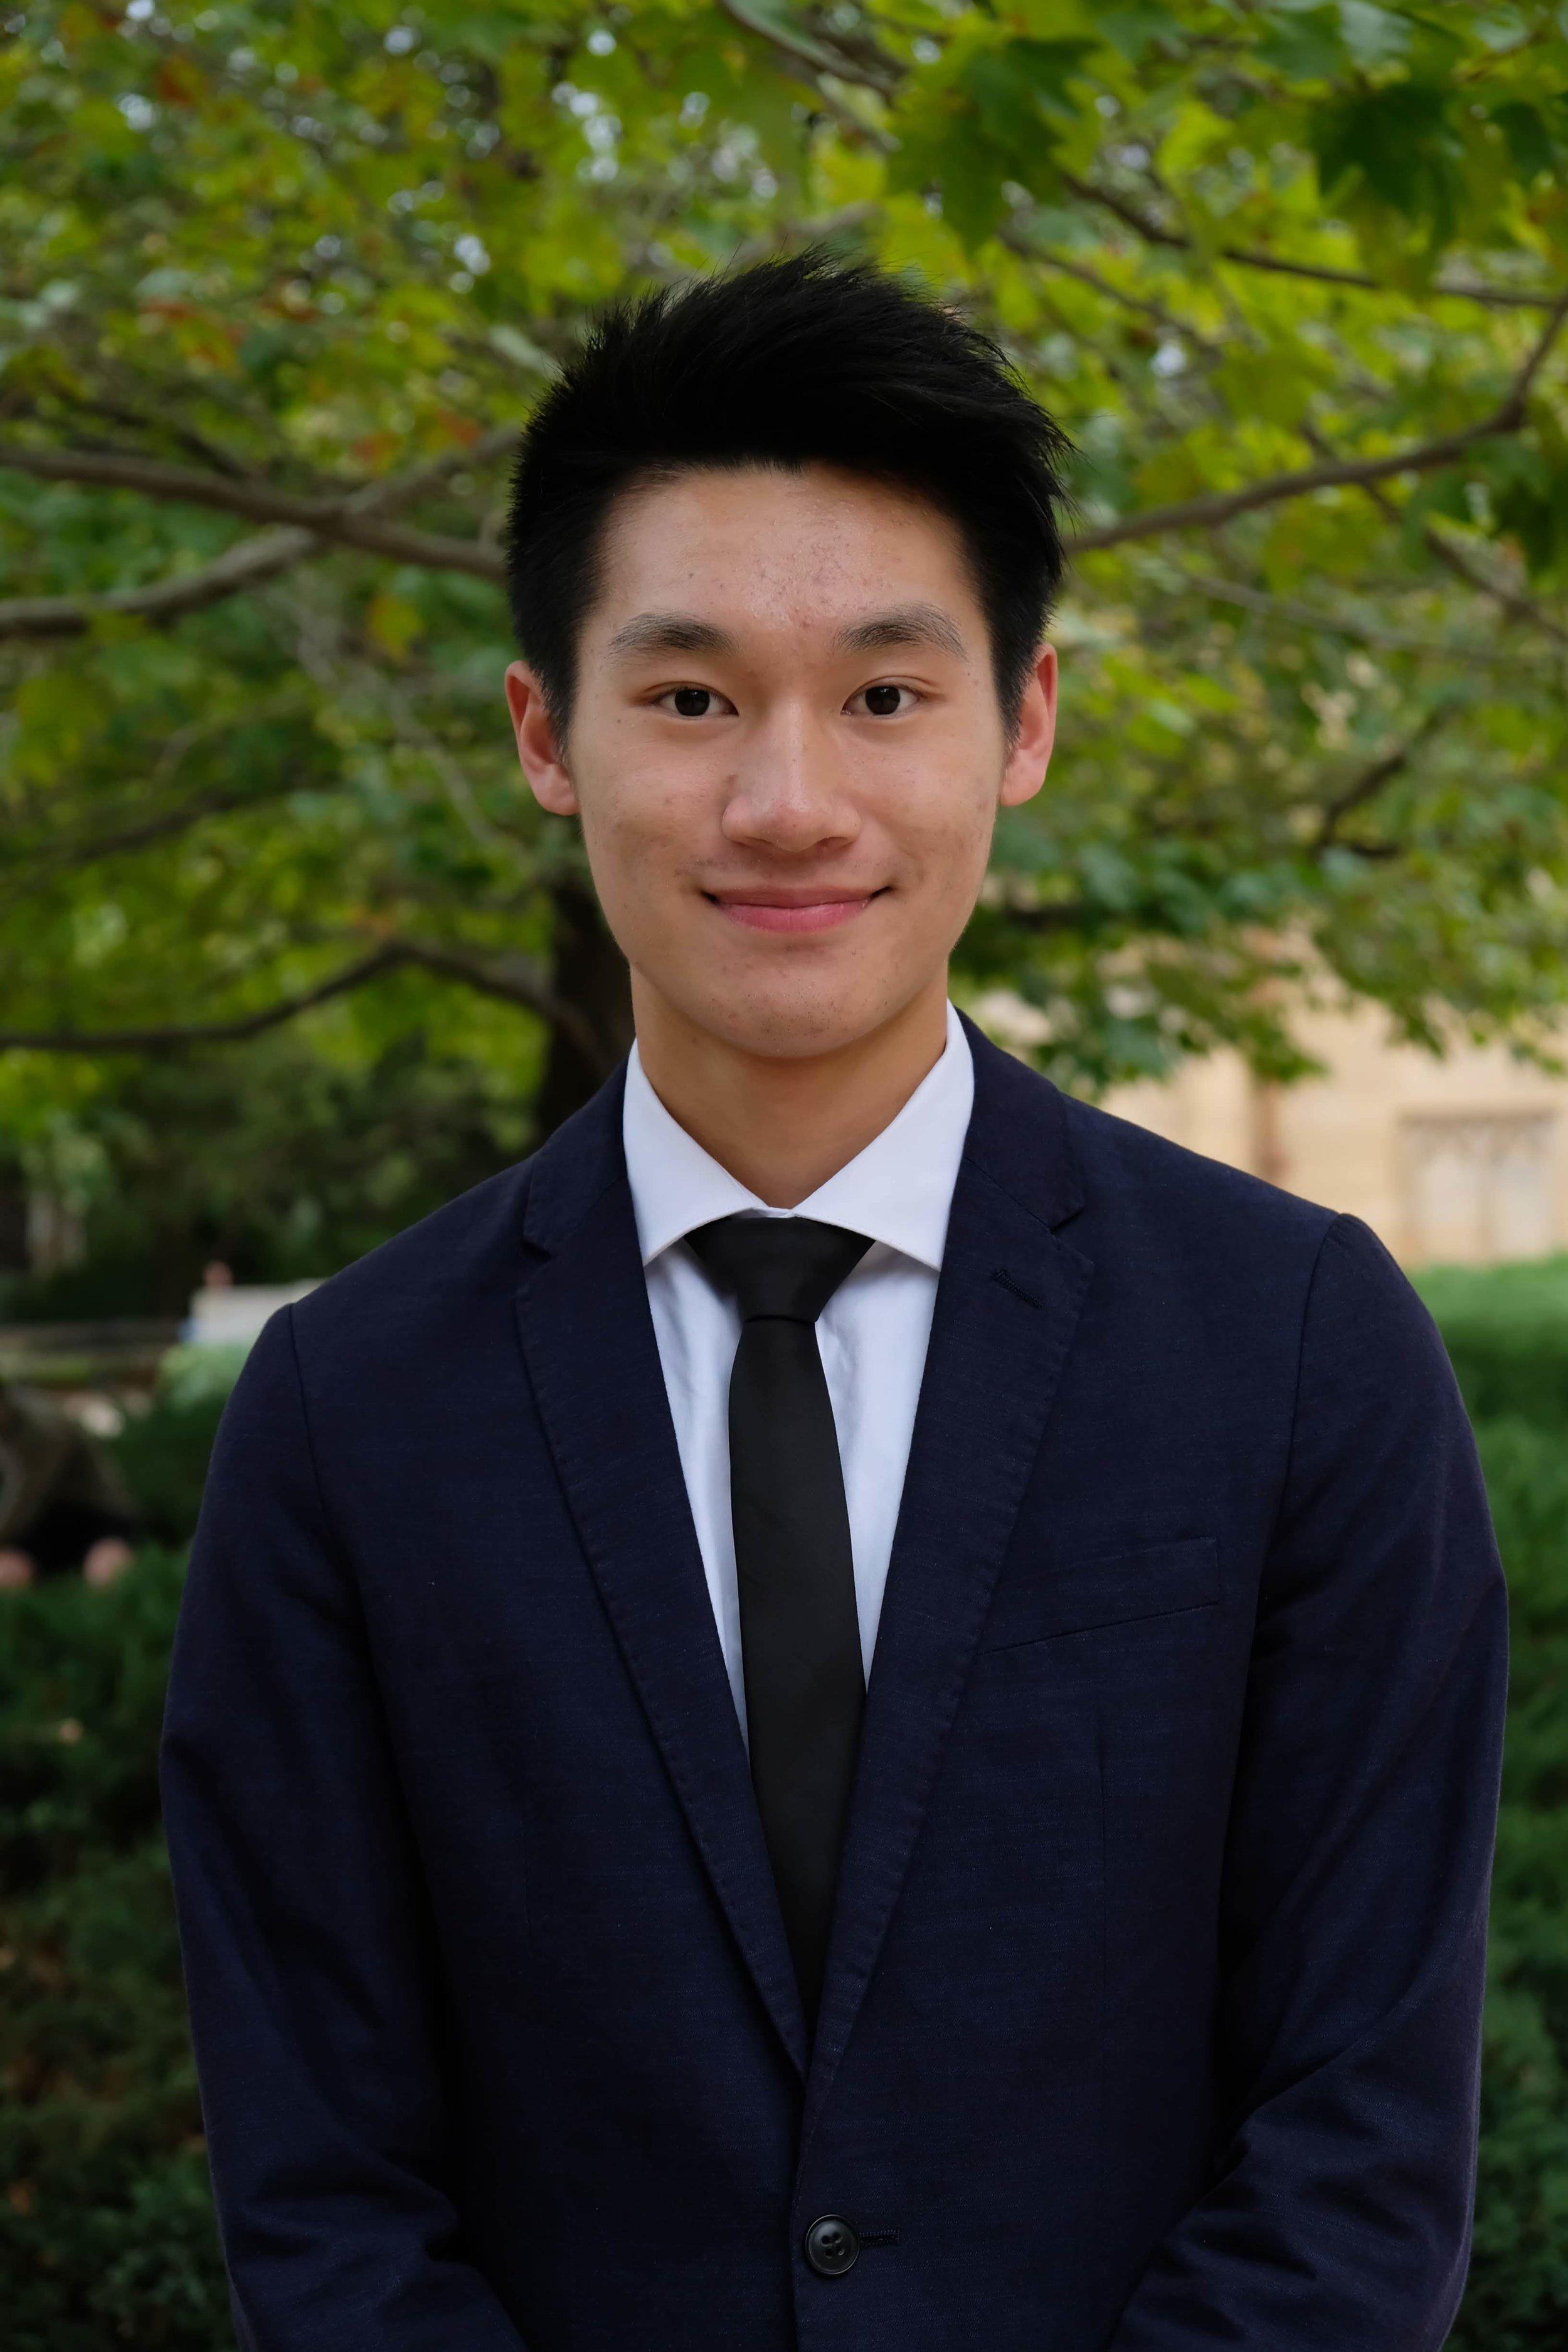 Alden Vong - Communications Officer